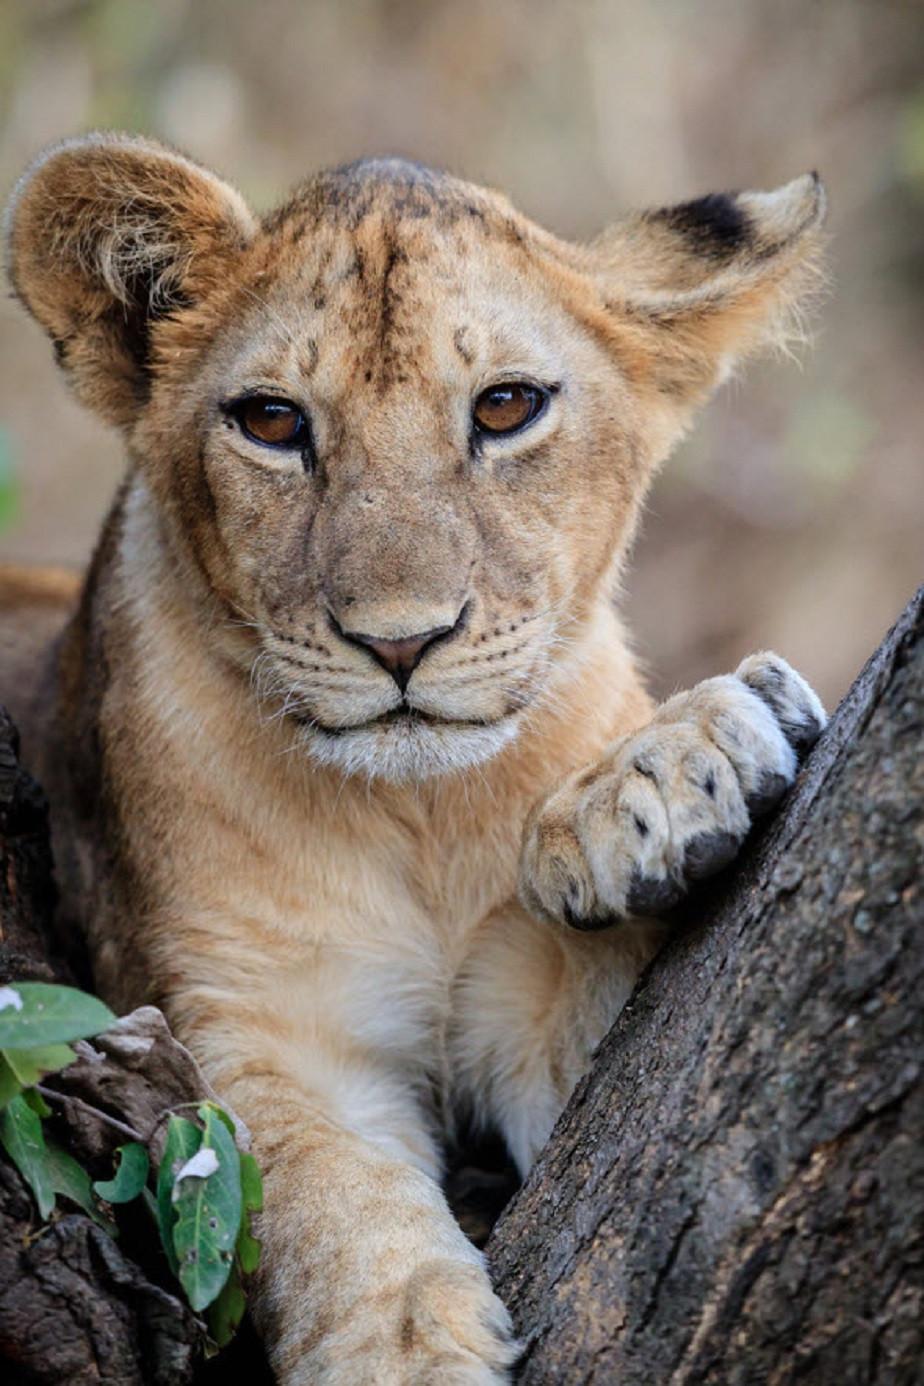 cute lion cube by wix photographer JA Dupont